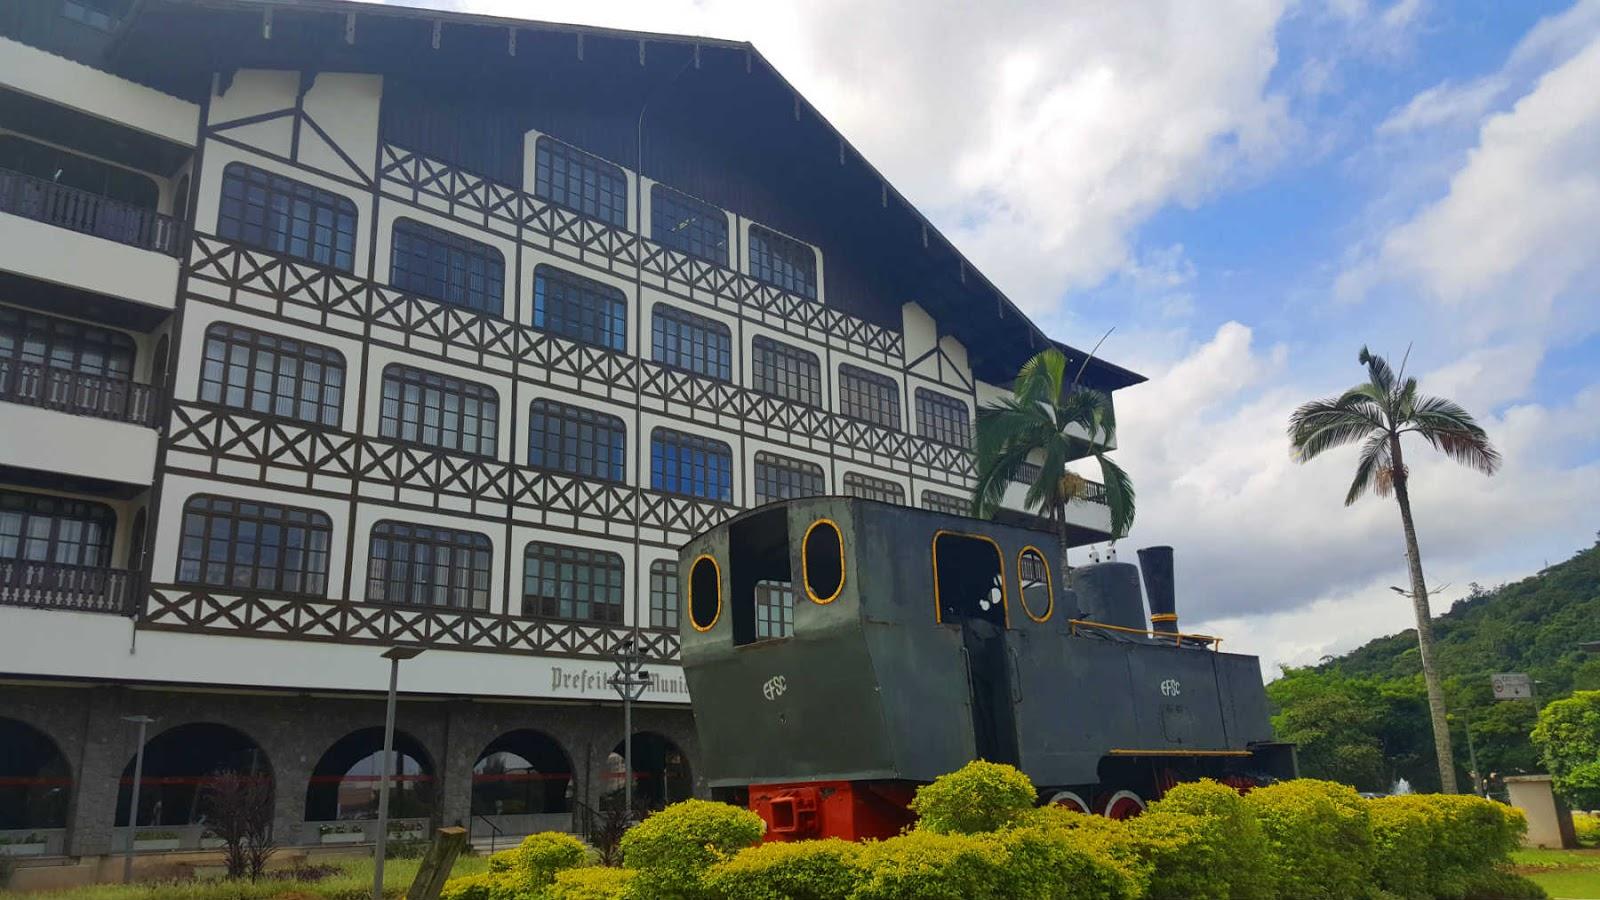 Prefeitura de Blumenau, Santa Catarina.